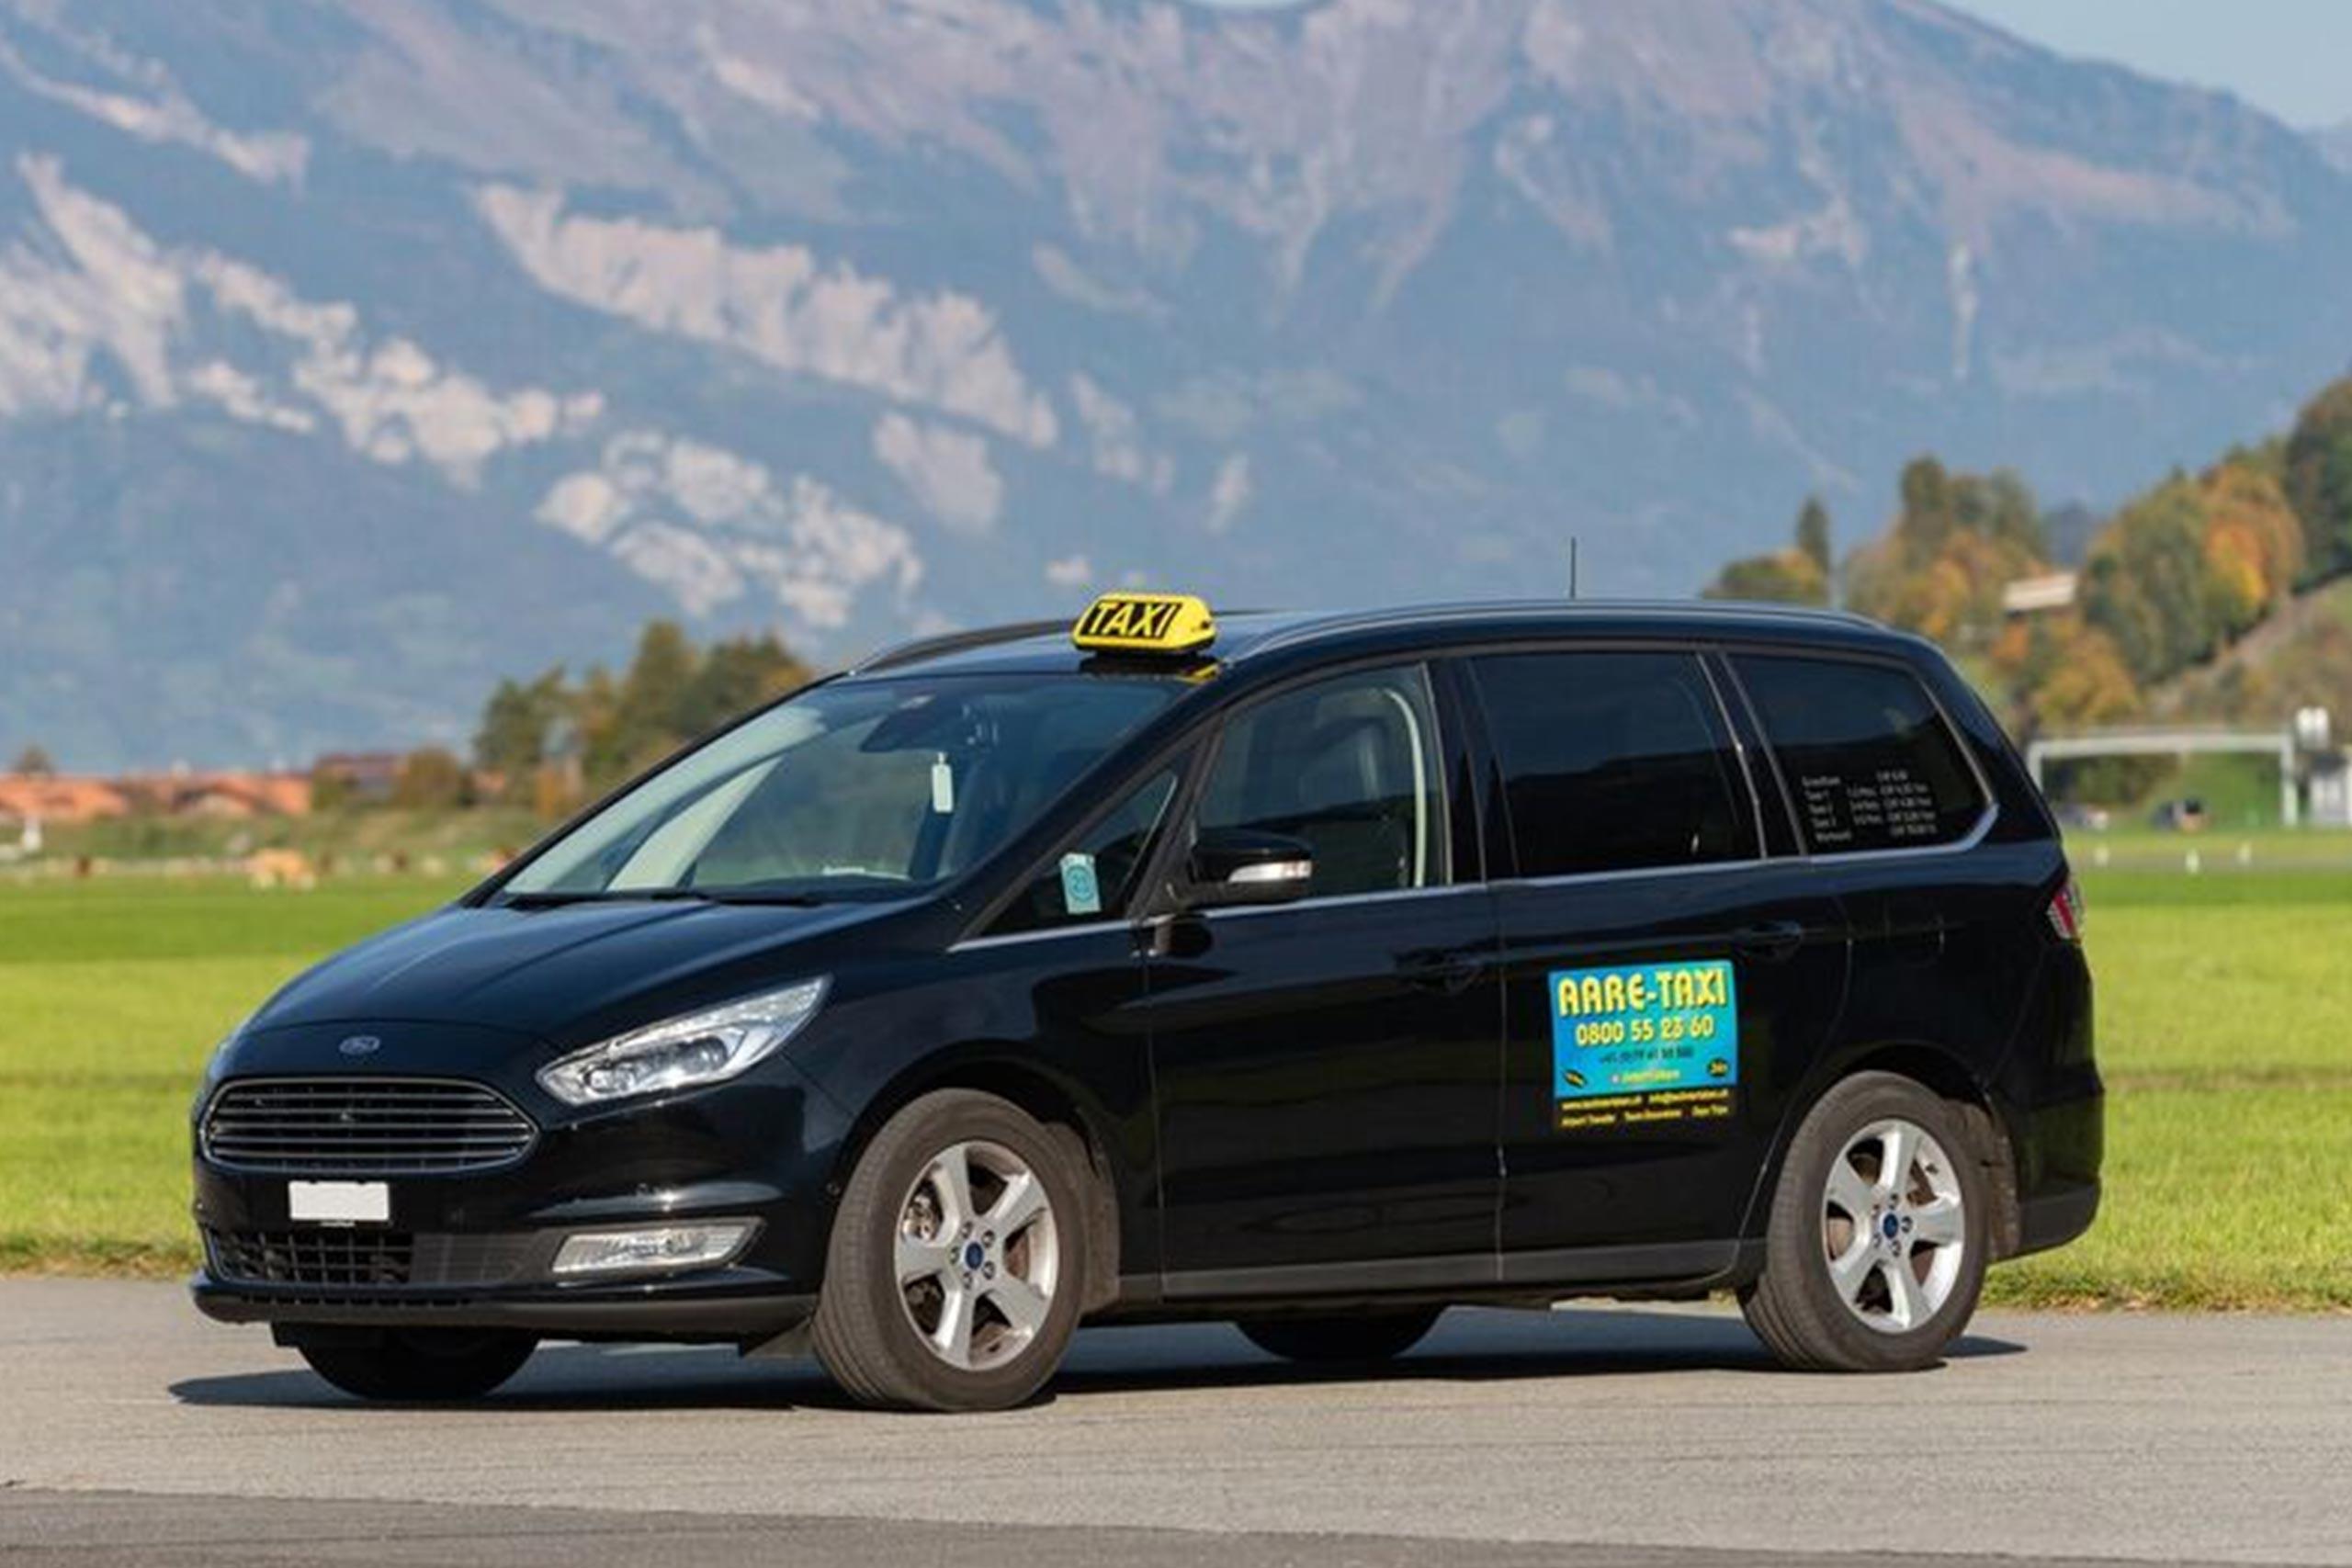 aare-taxi-fahrzeug-ford-schwarz.jpg